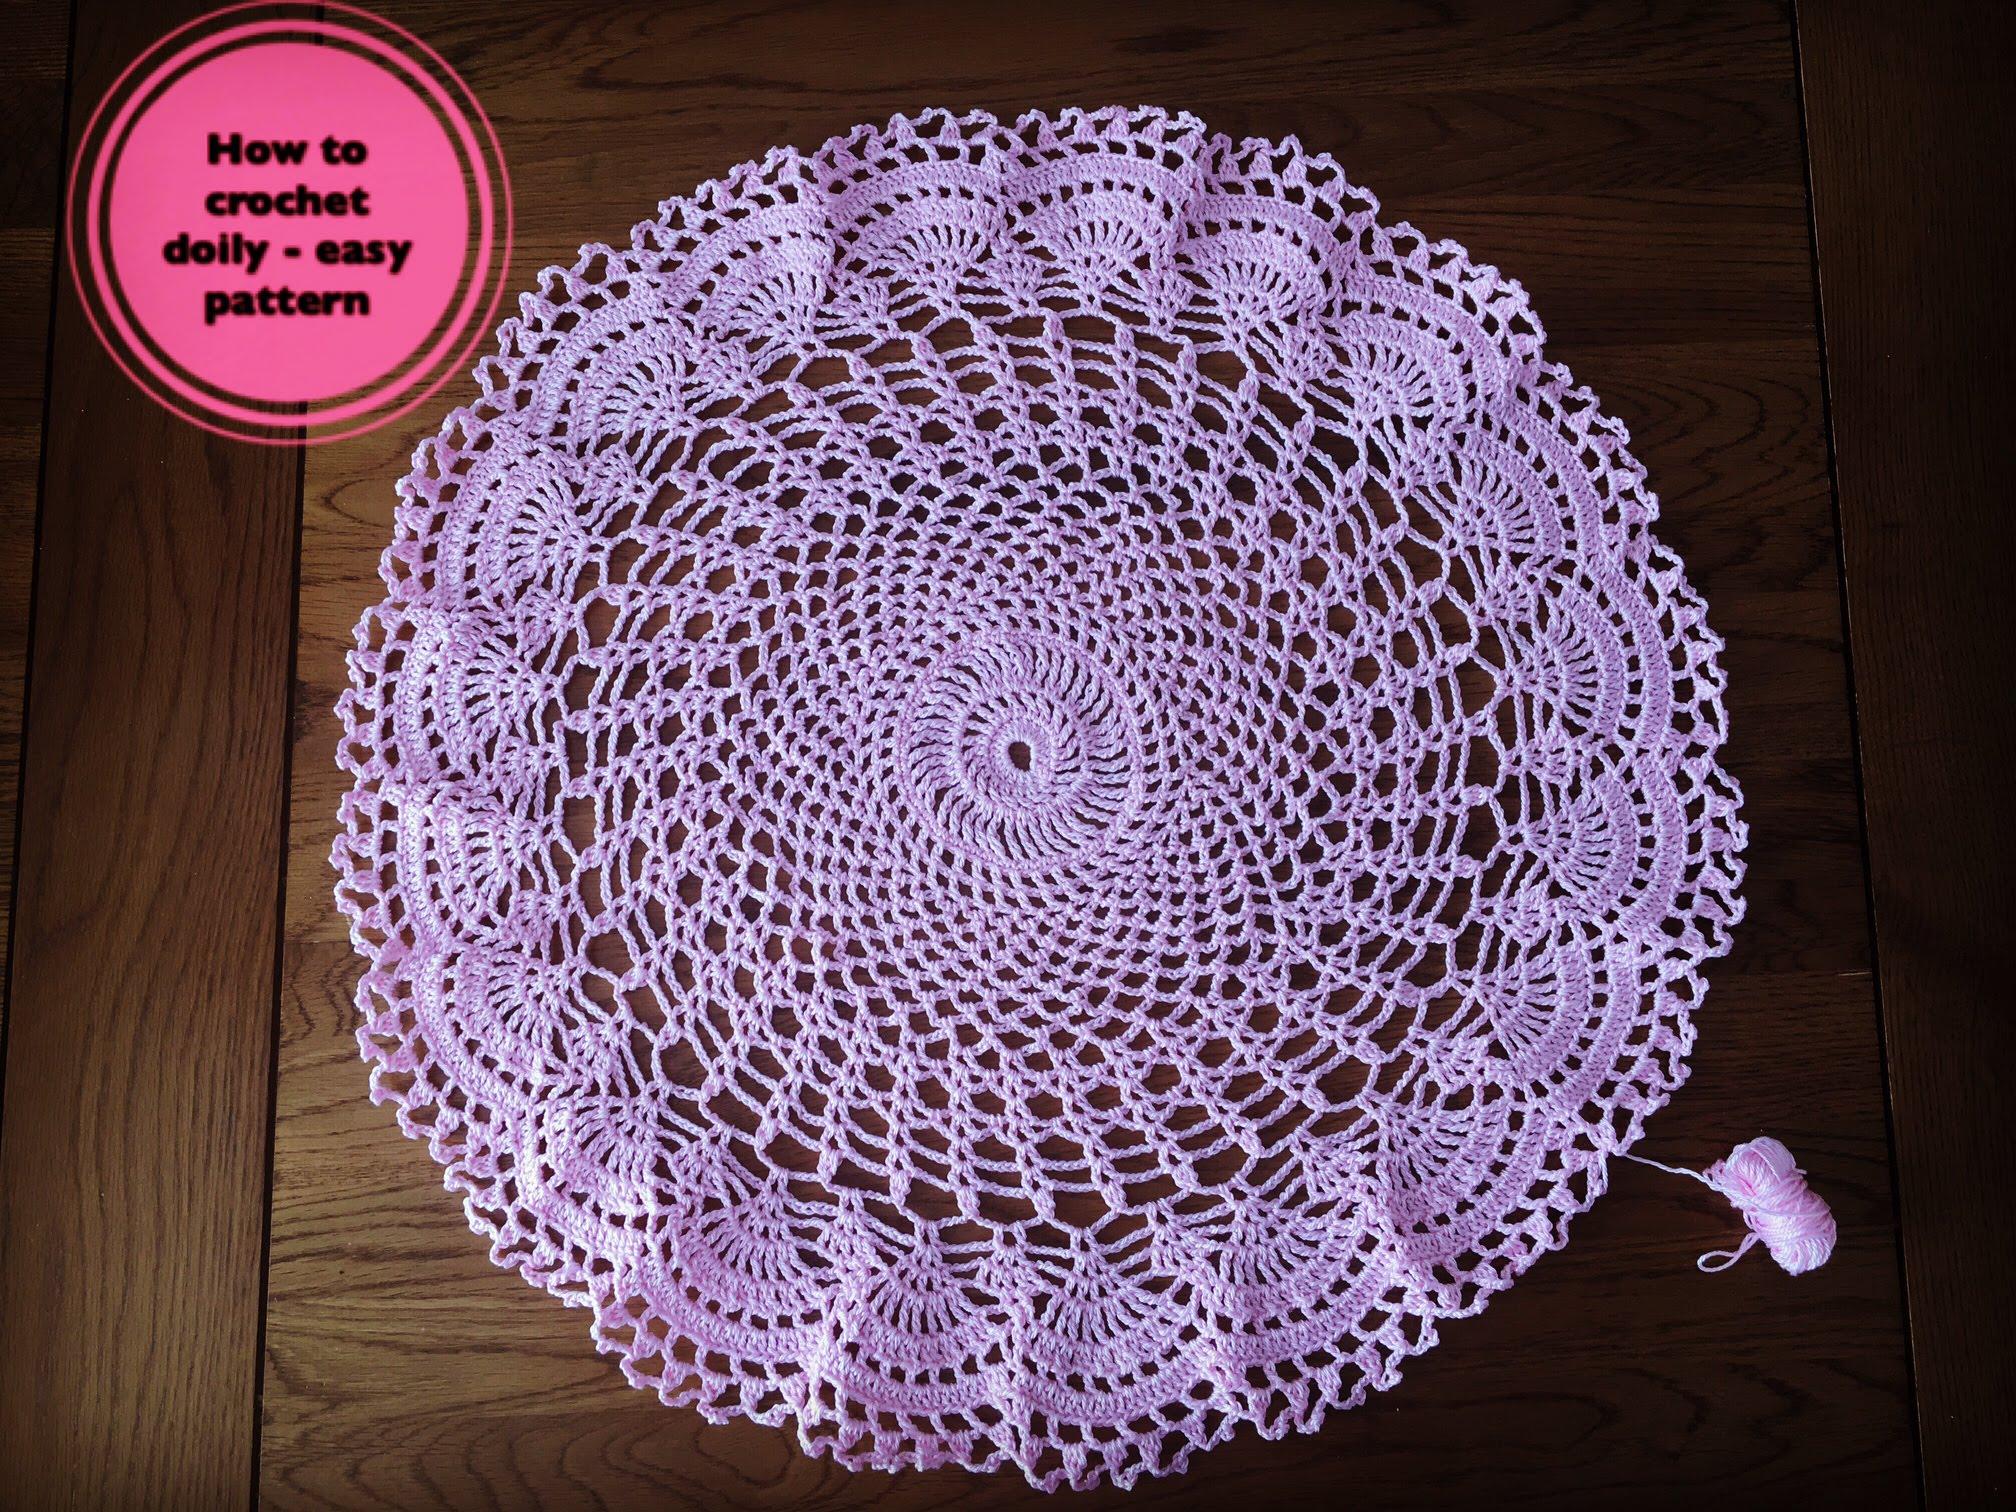 crochet doilies how to crochet doily - easy pattern - youtube THVATZL